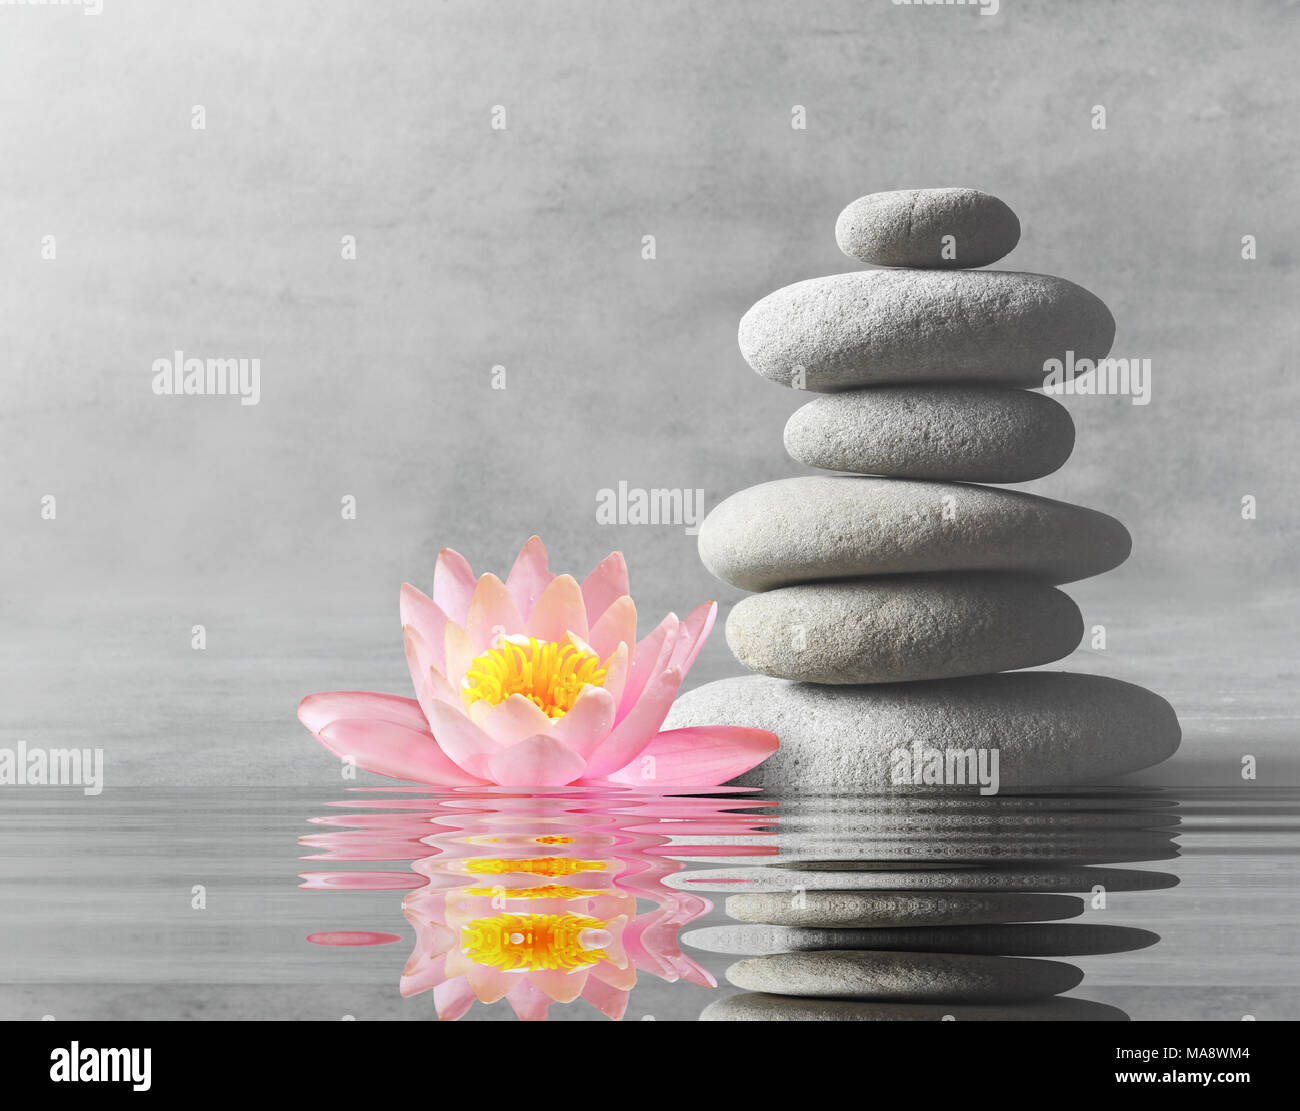 Spa flower stones water stock photos spa flower stones water stock stones and pink flower lotus balance zen and spa concept stock image izmirmasajfo